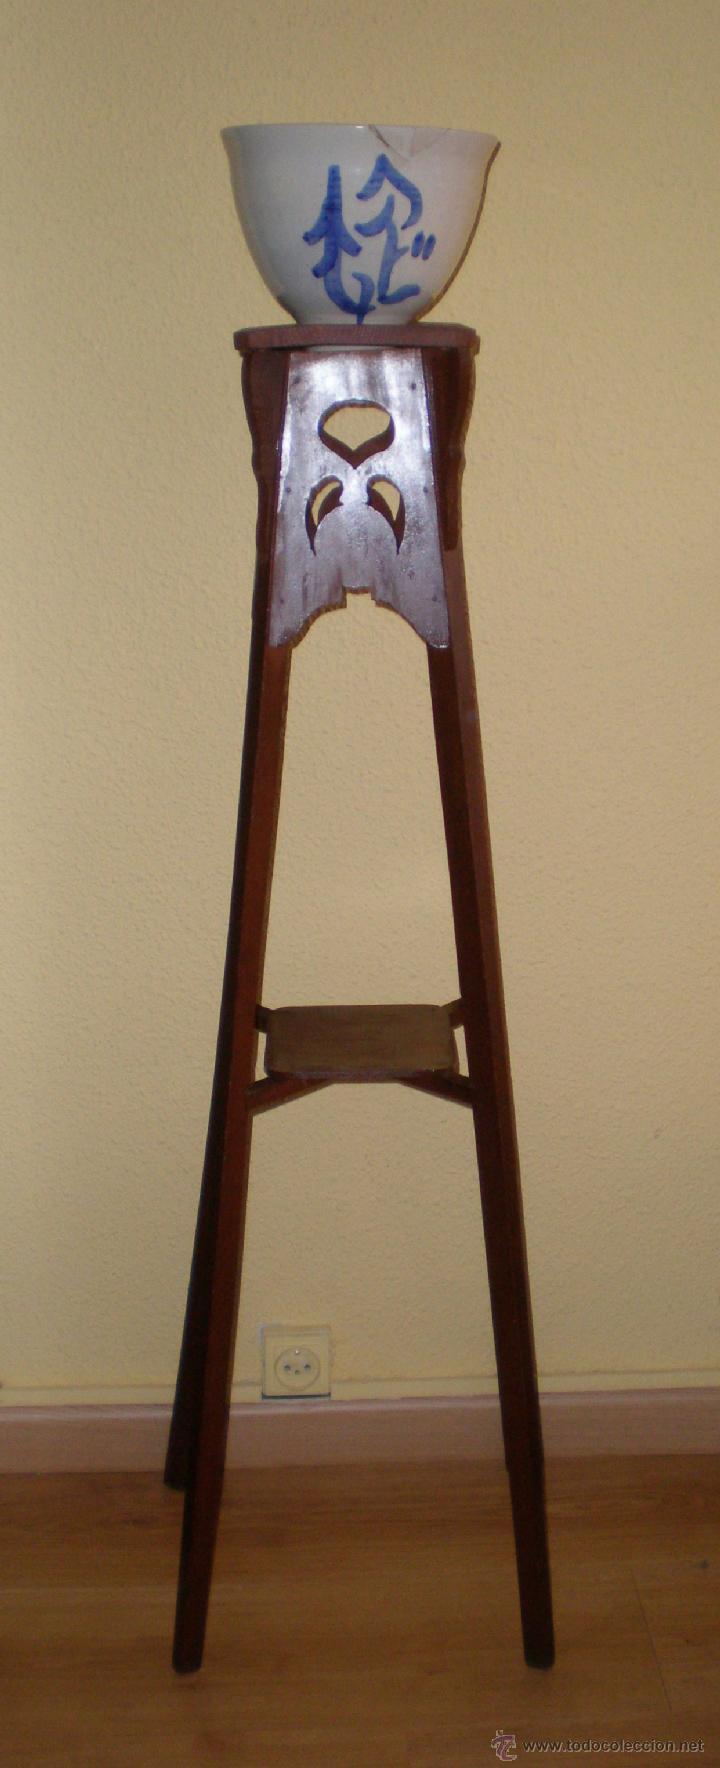 Pedestal peana de madera portamacetas con mace comprar for Muebles auxiliares clasicos madera